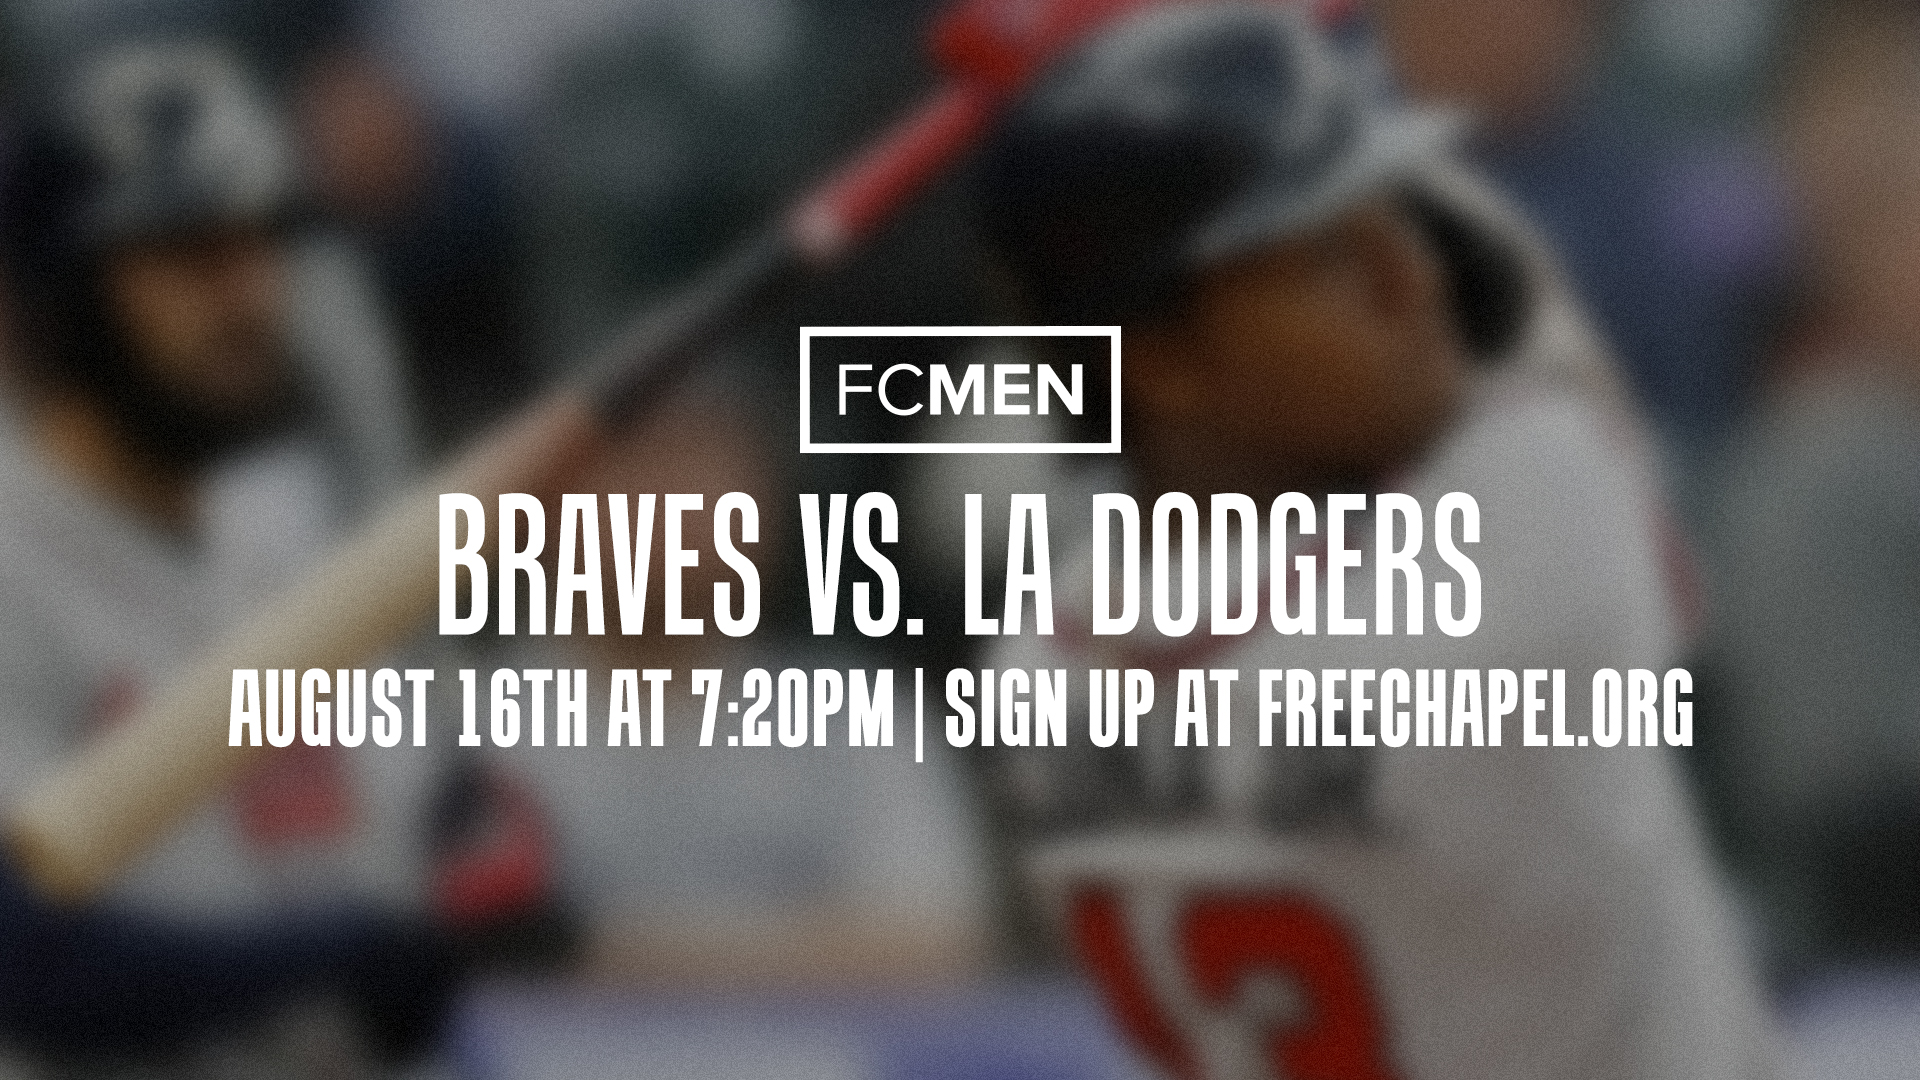 FCMen Braves vs. Dodgers at the Gainesville campus